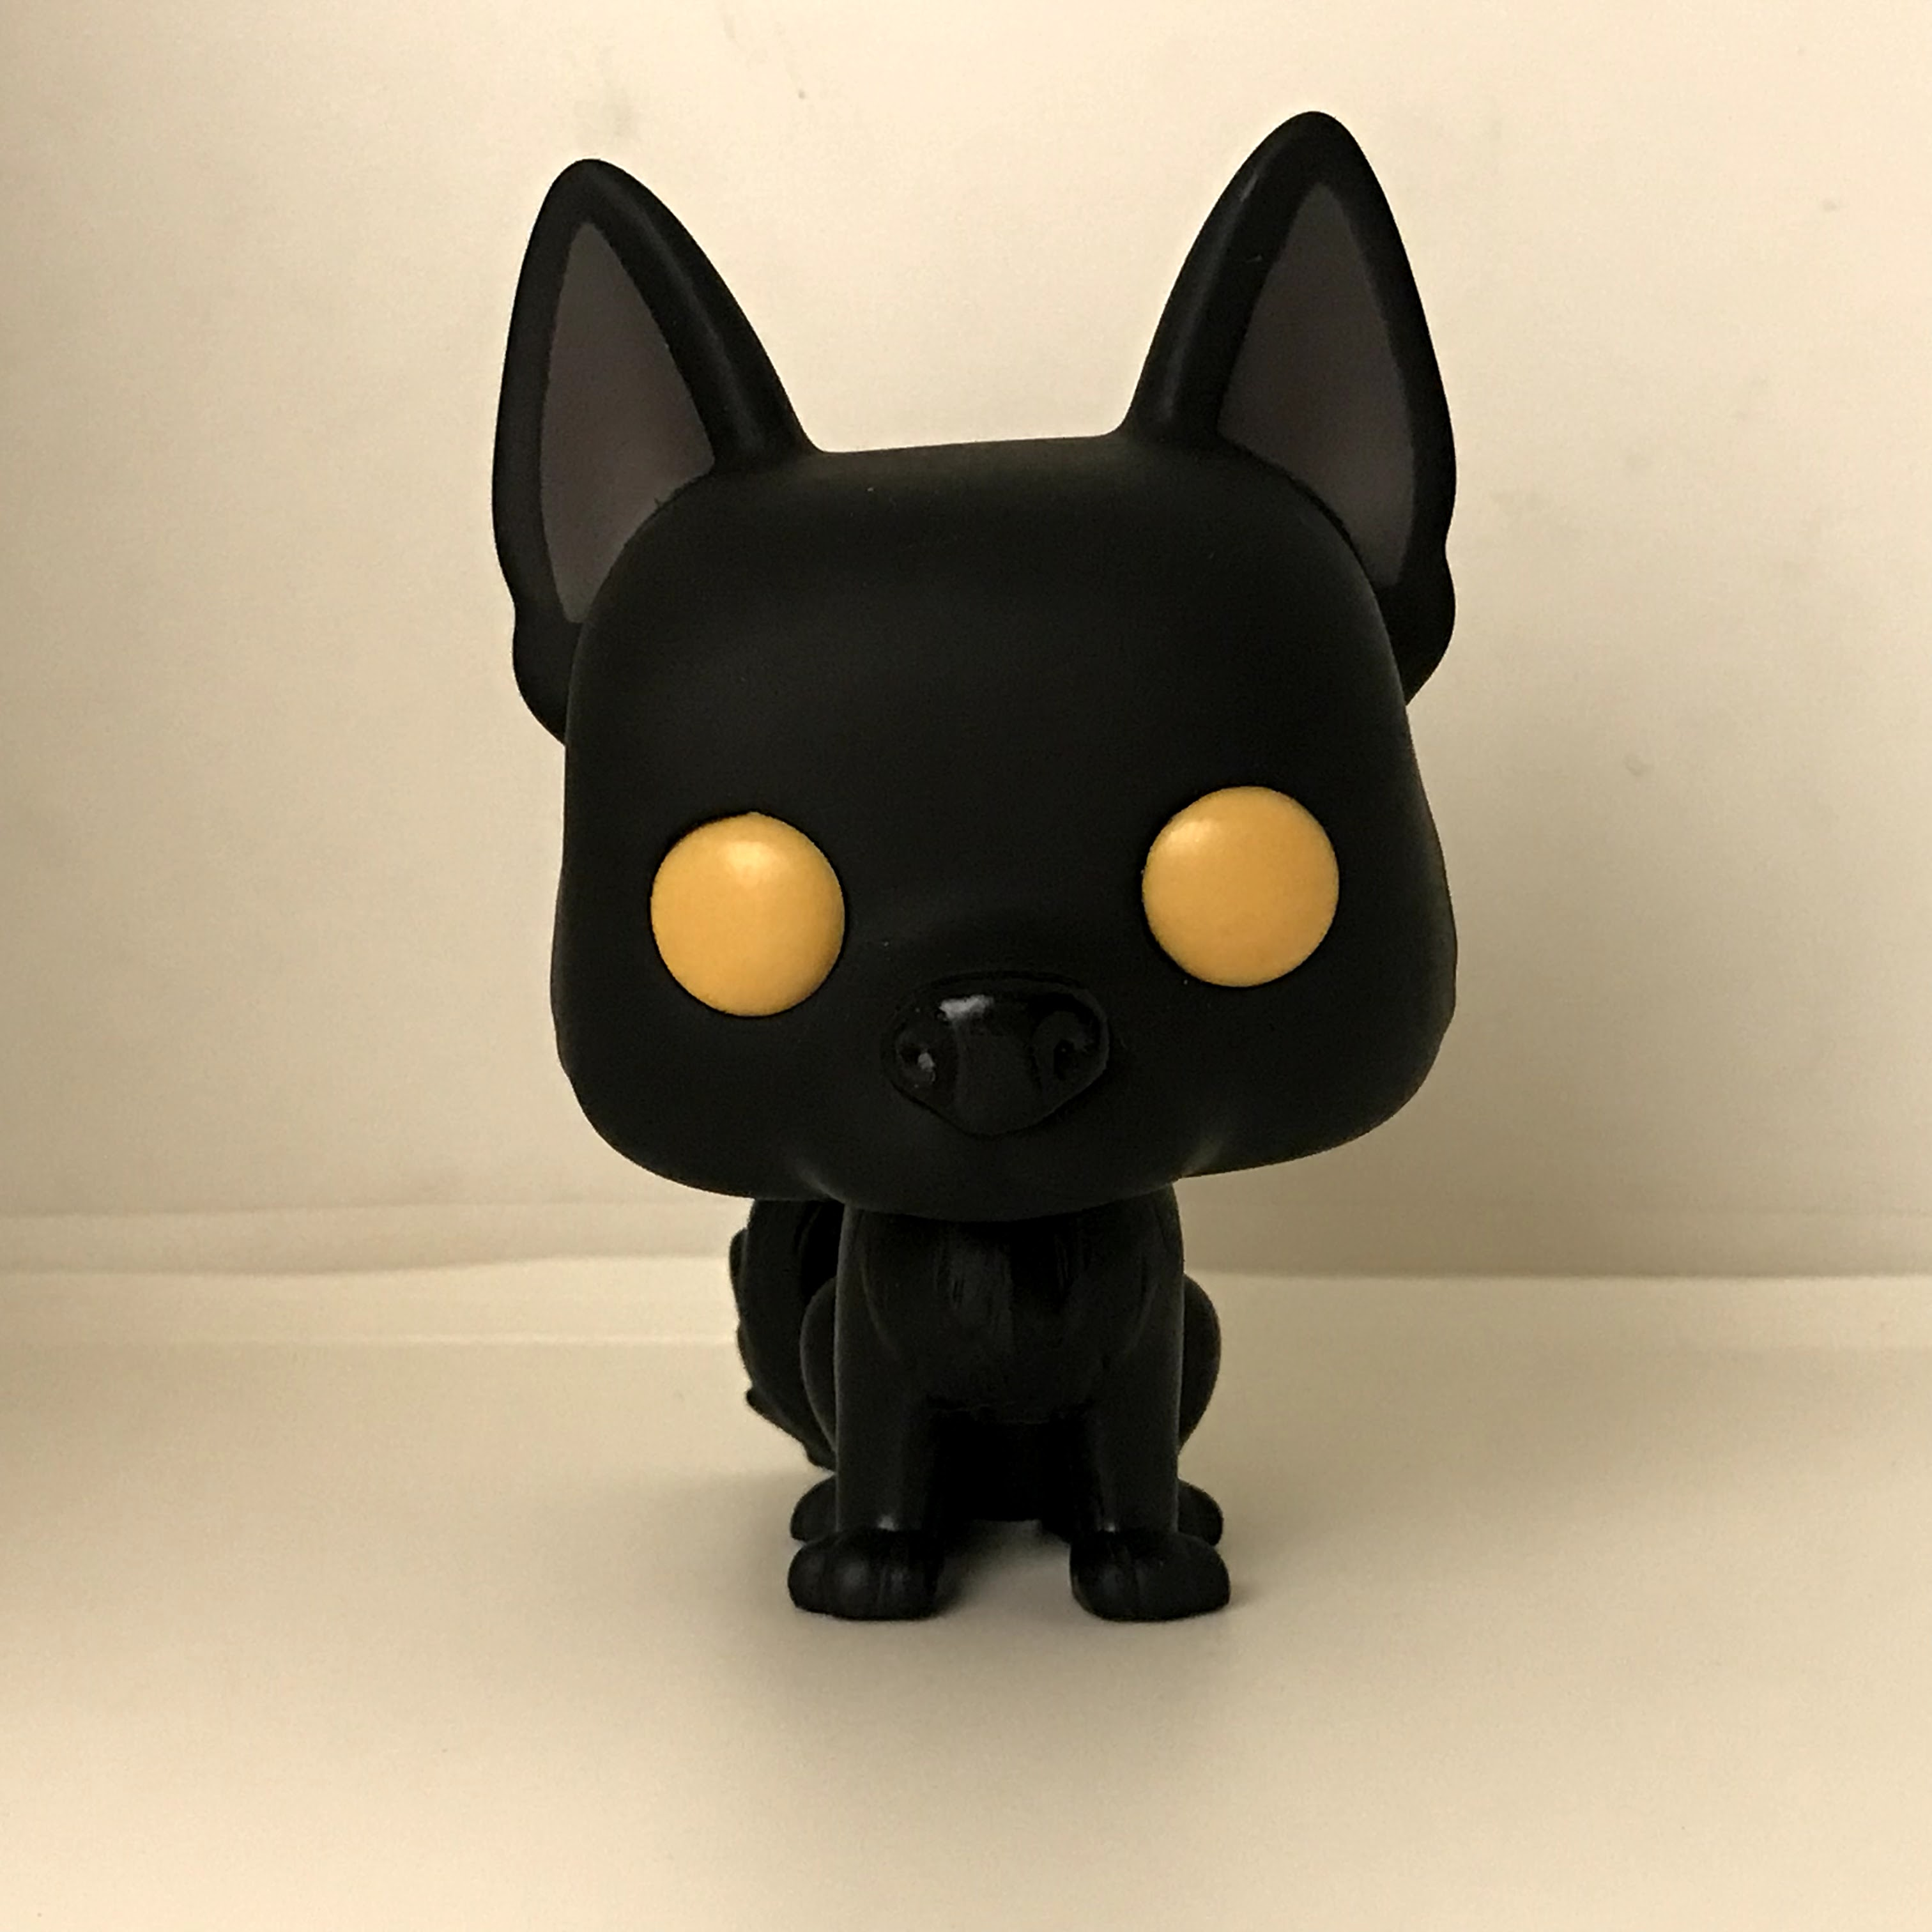 73 Sirius Black as a Dog